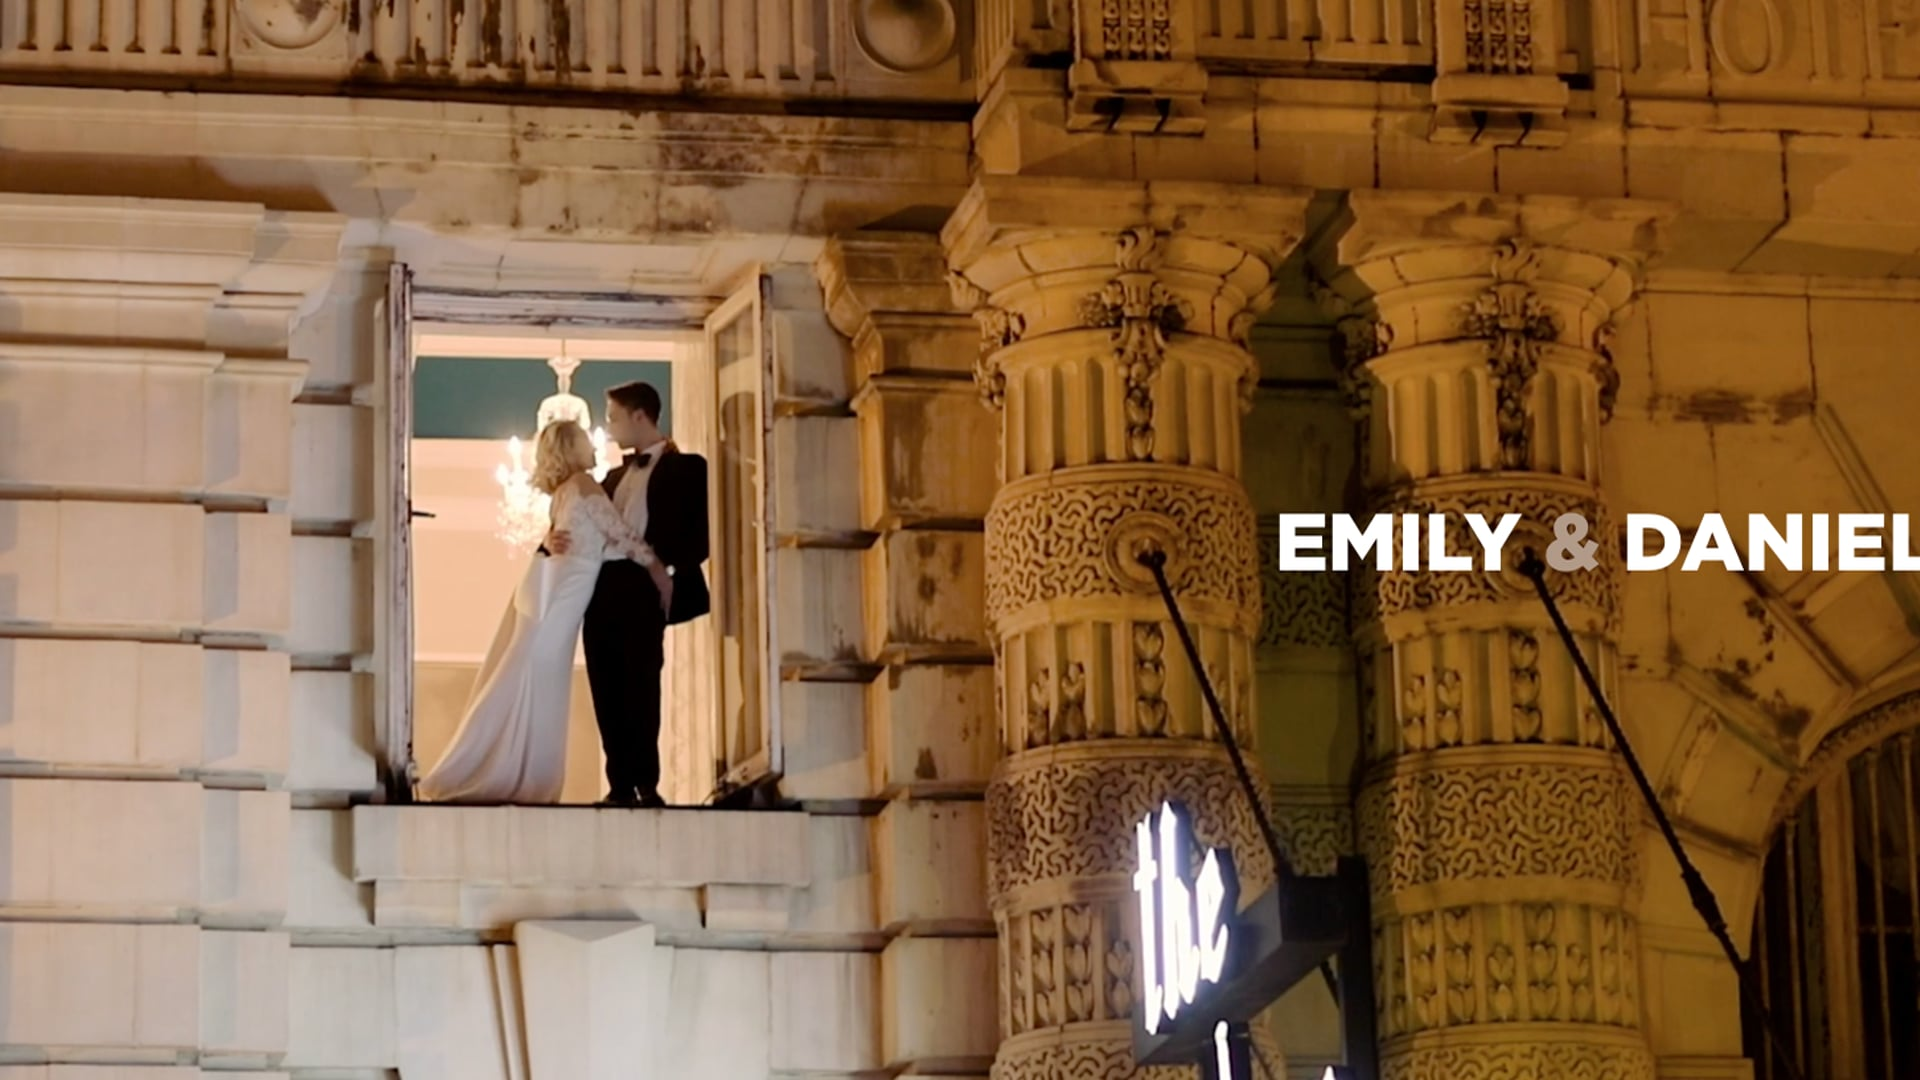 Emily & Daniel Wedding Highlight Film at the Belvedere